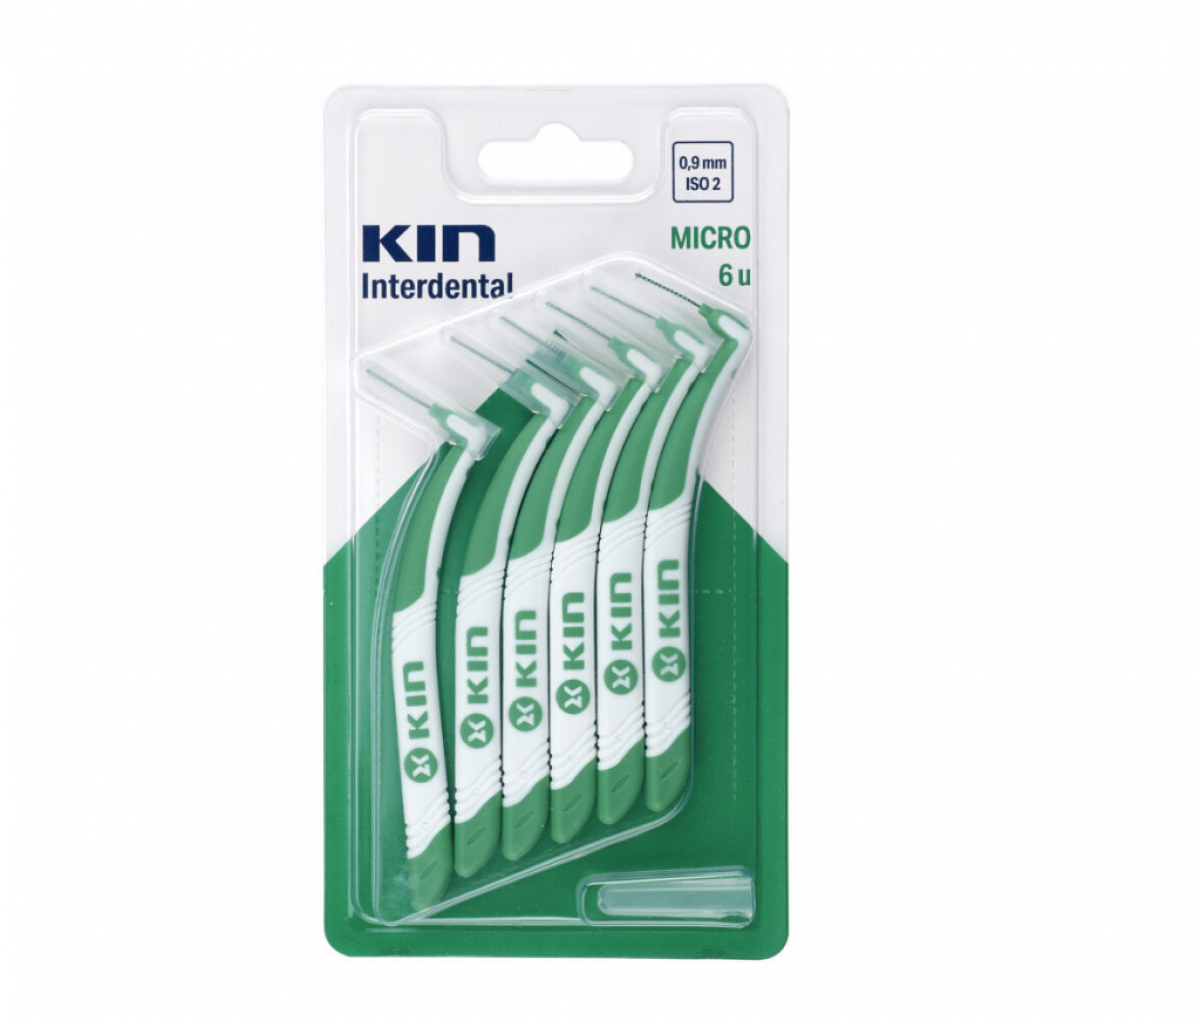 KIN Microprox Interdental Brush 0.9mm